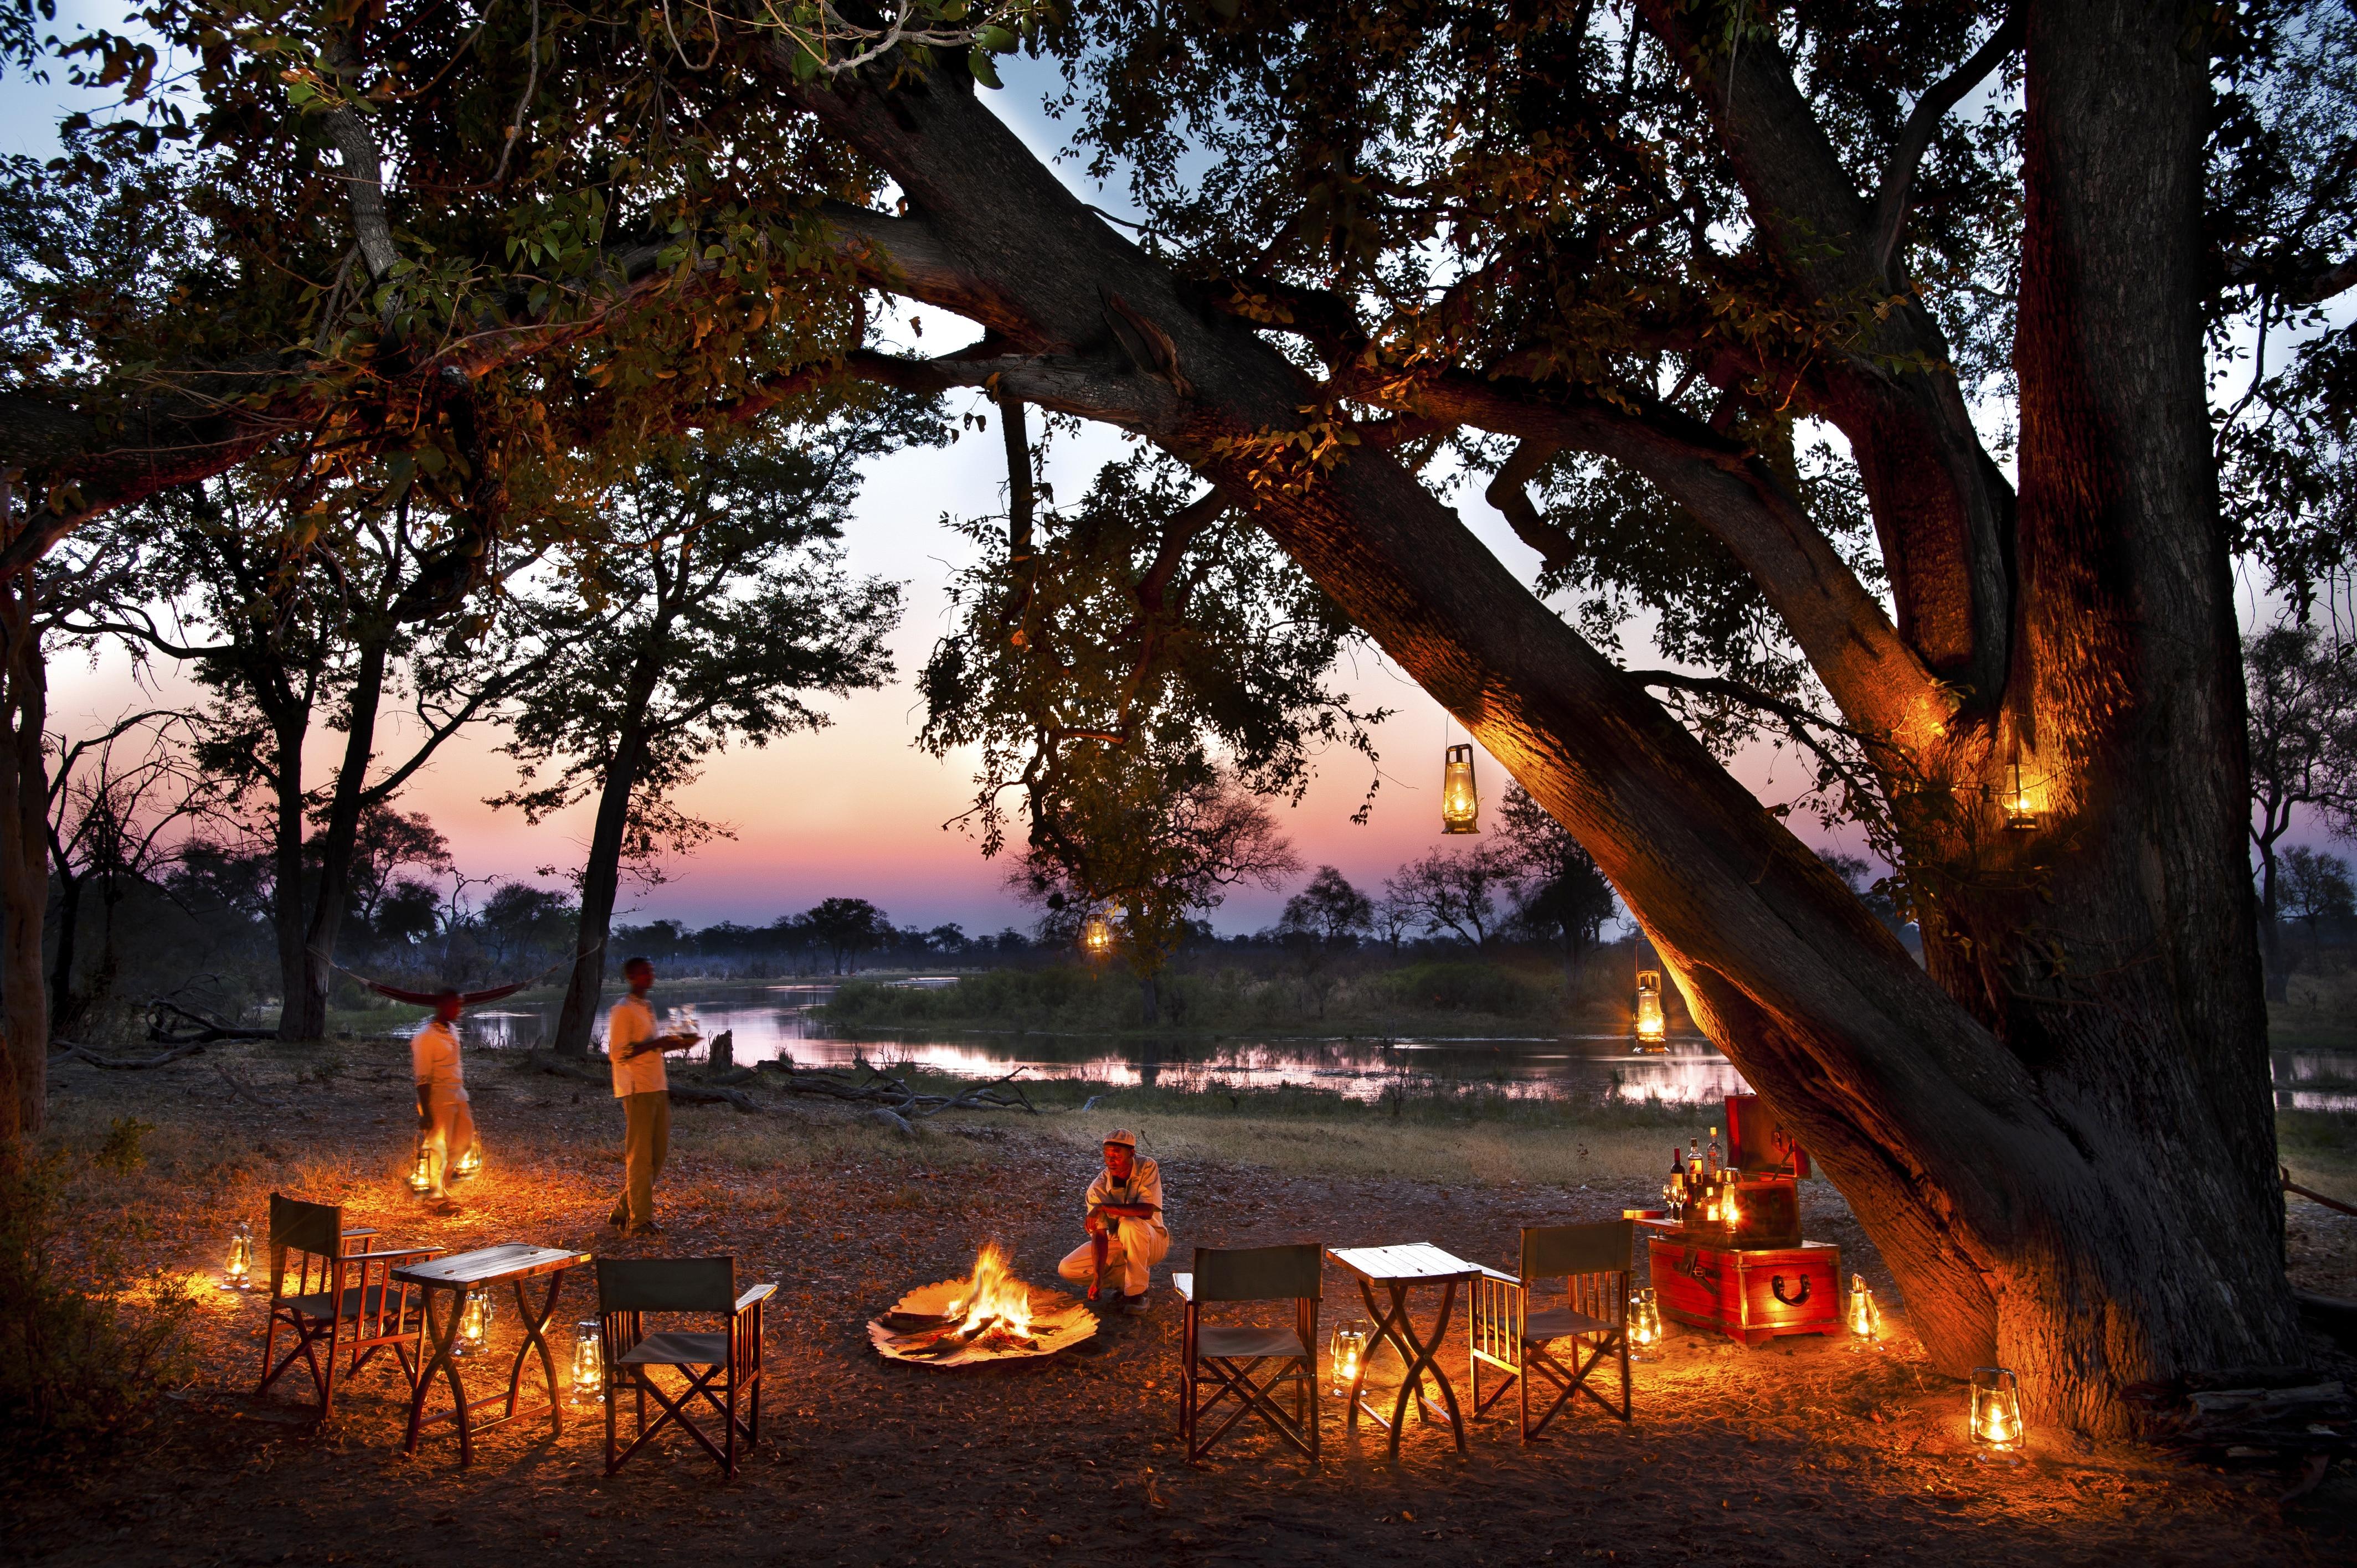 Africa,Botswana,Liyanti,Alojamiento,Selinda Explorer,anochecer,hoguera